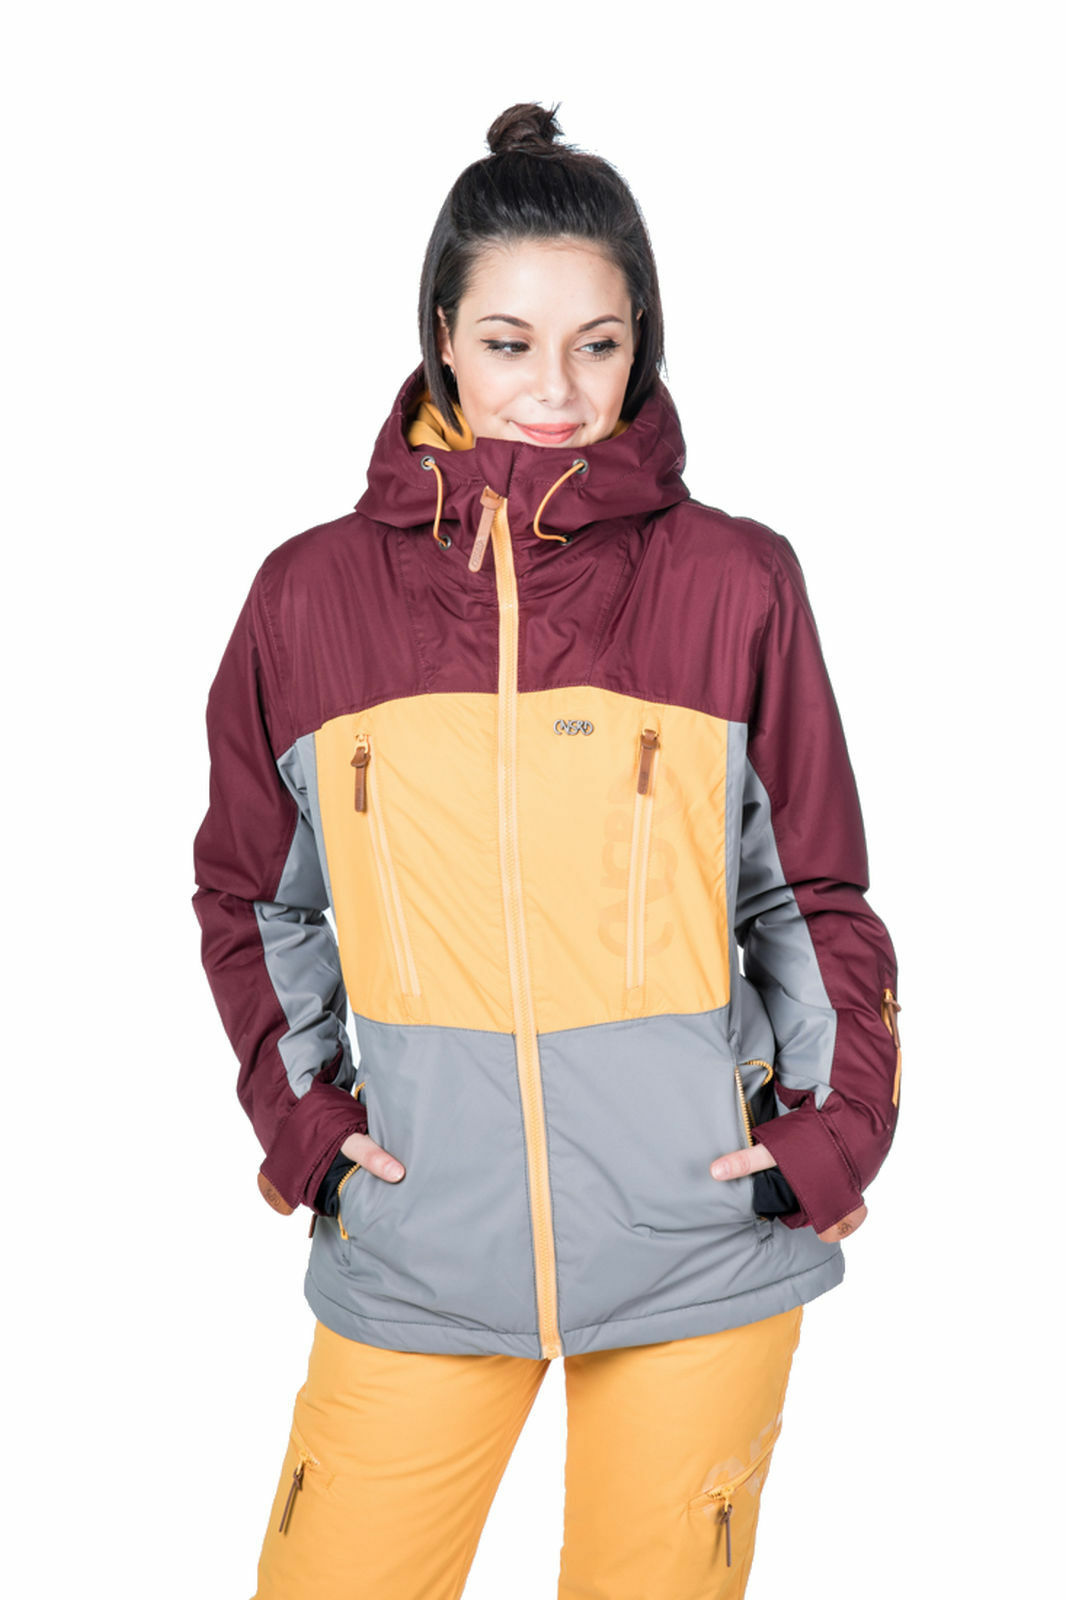 Csnrd Snowboard Mujer Chaqueta Esquí Alexis Chaqueta Uva